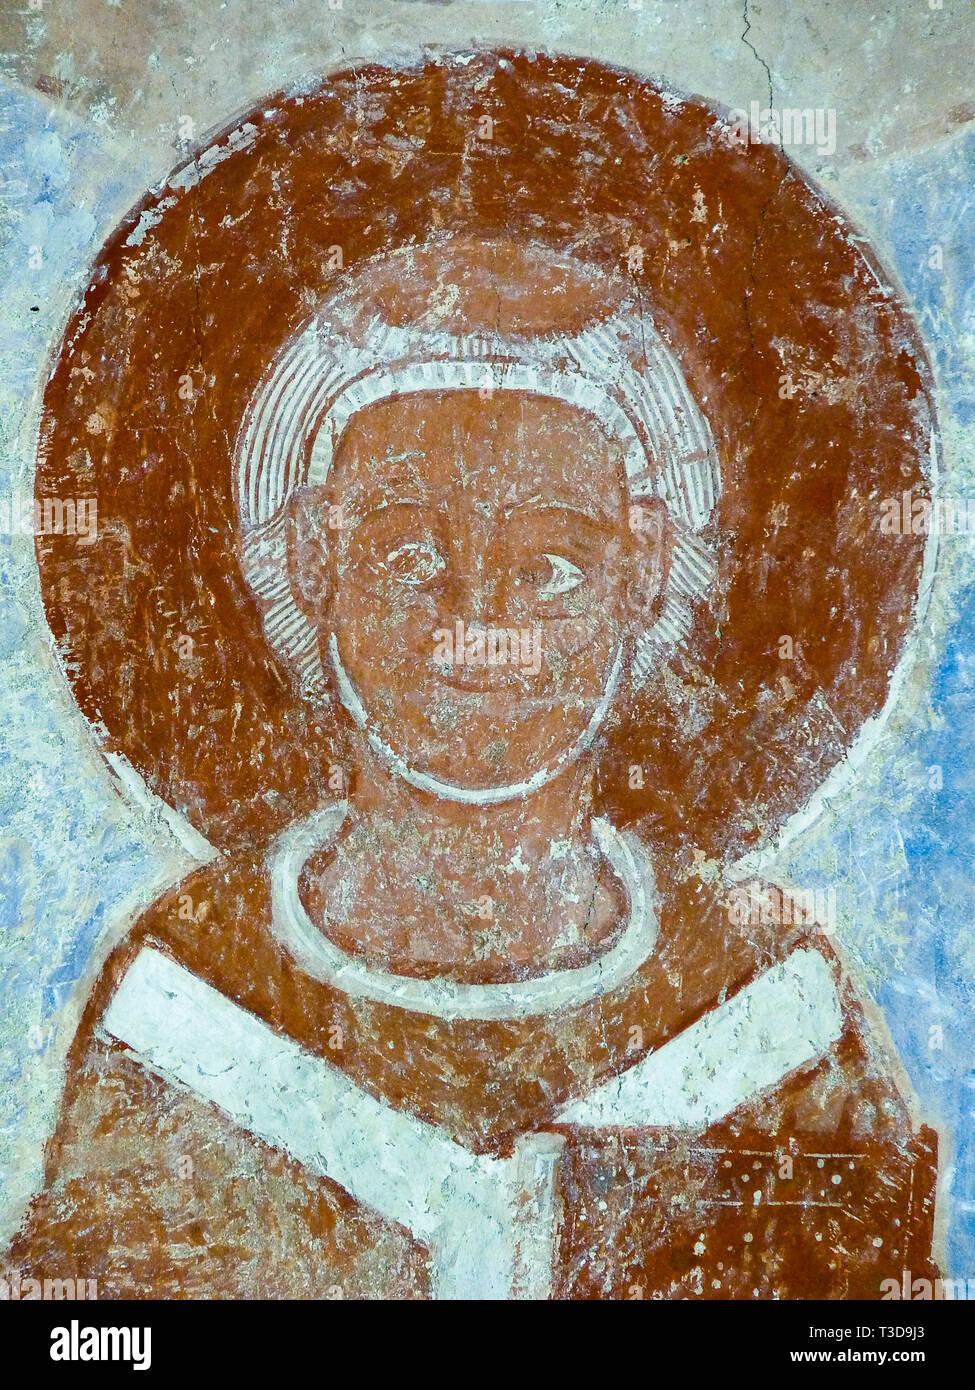 Romanesque fresco of an archbishop in Finja church, Sweden, Oct 07, 2009 - Stock Image